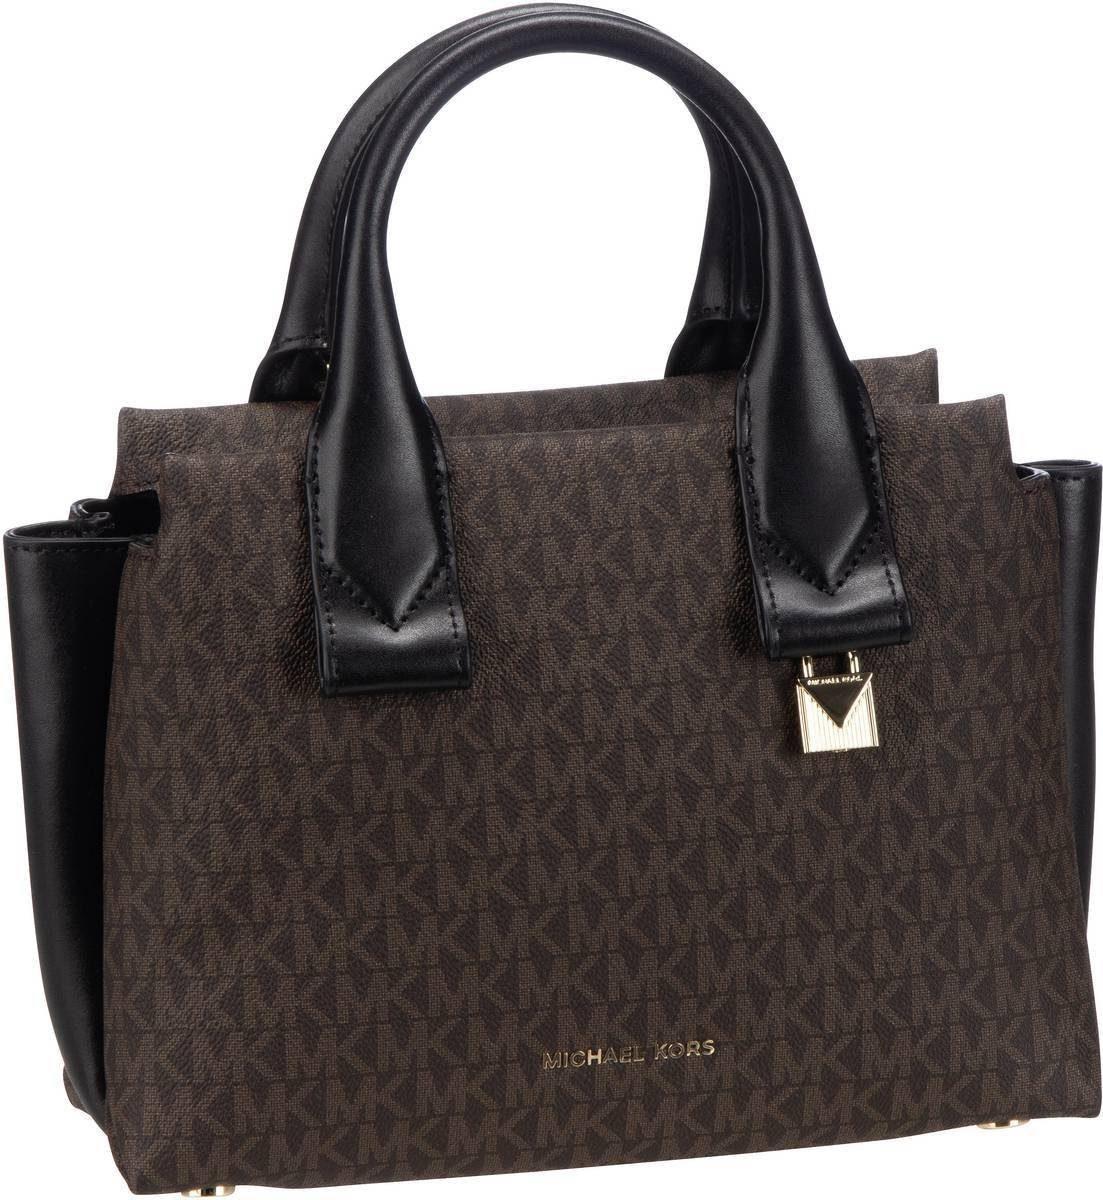 MICHAEL KORS Handtasche »Rollins Small Satchel MK Signature«